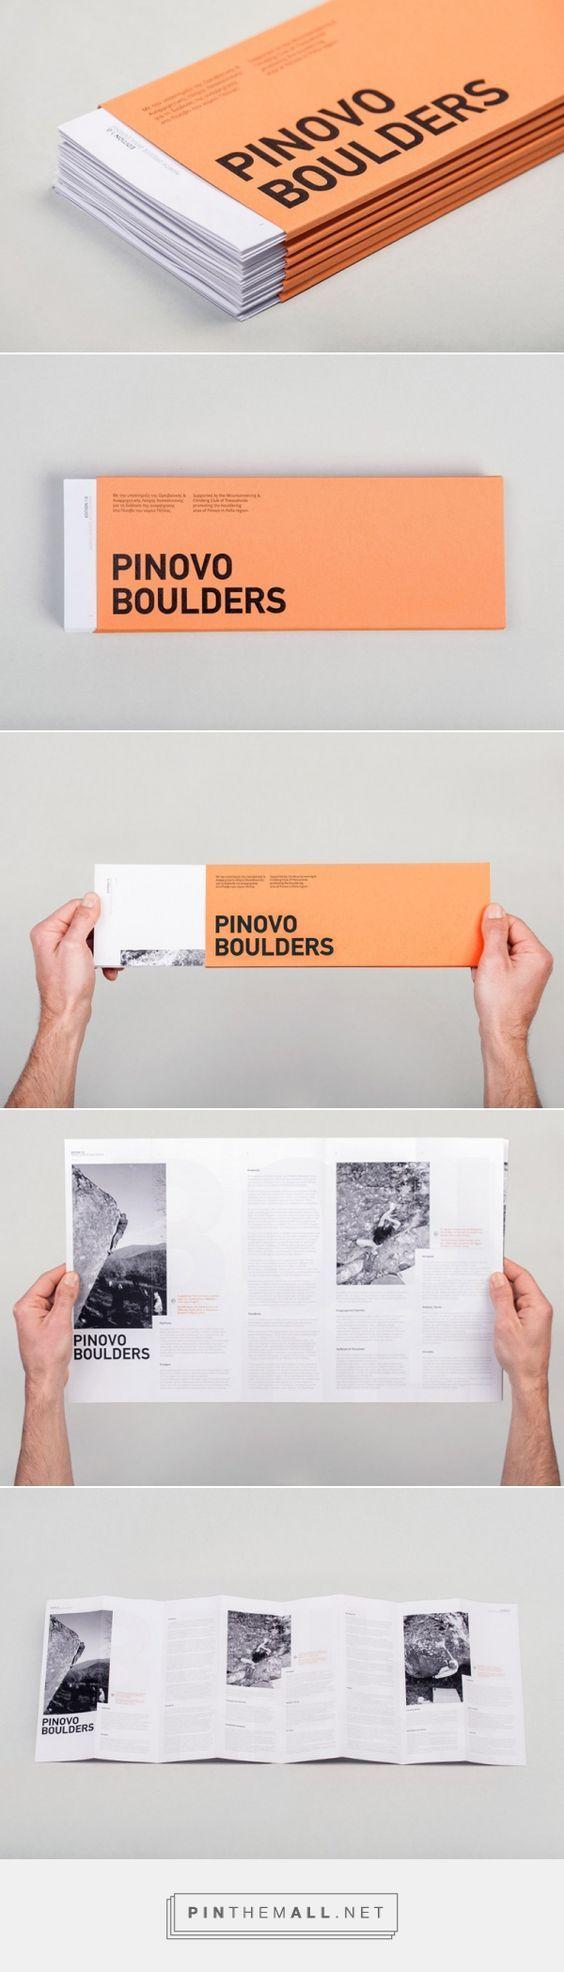 FPO: Pinovo Boulders Brochure - created via http://pinthemall.net: